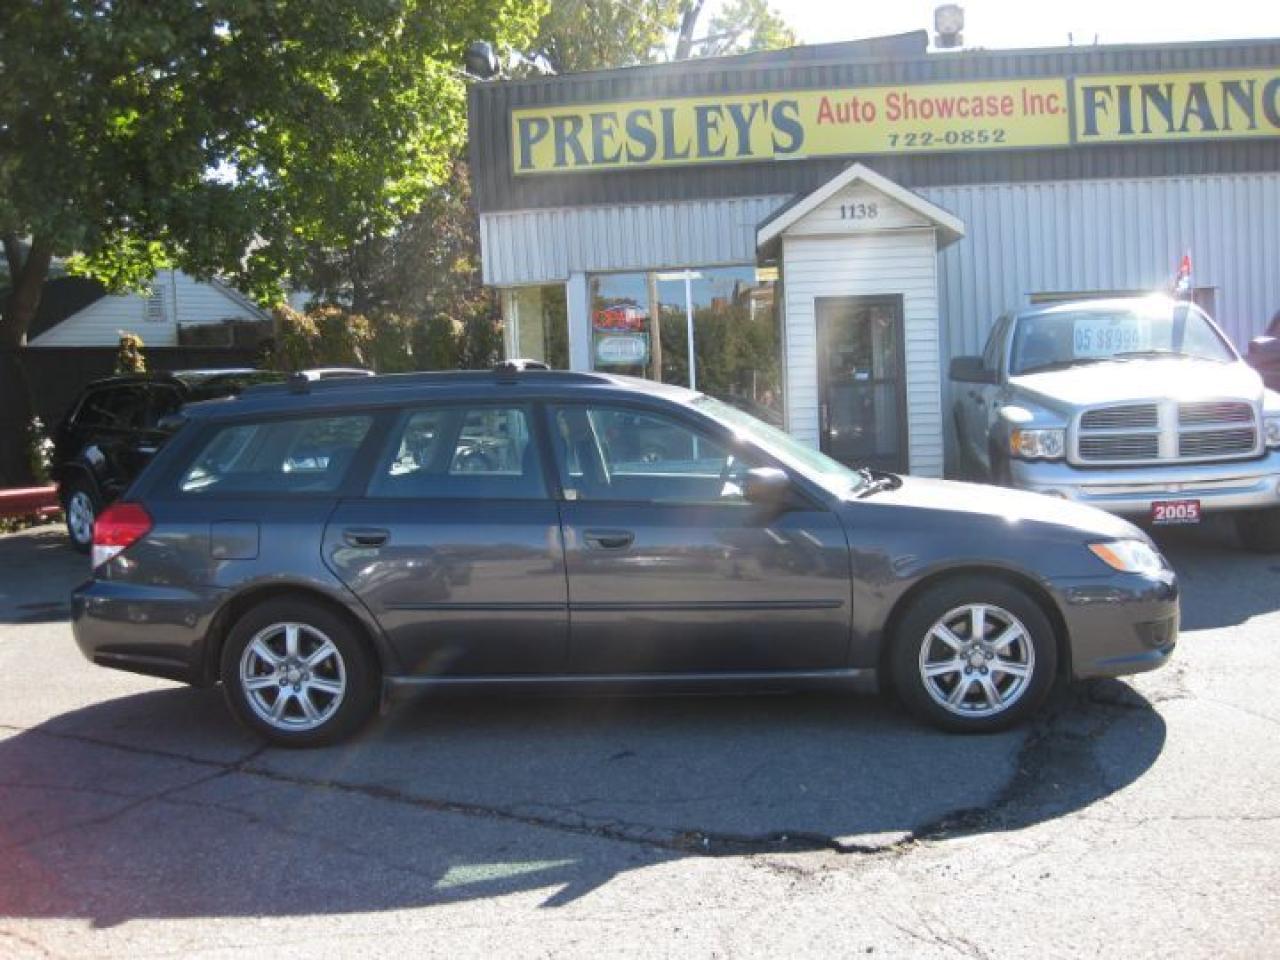 2008 Subaru Legacy 4cyl, AWD, 2.5L,htd seats, p/w p/l cruise, alloys